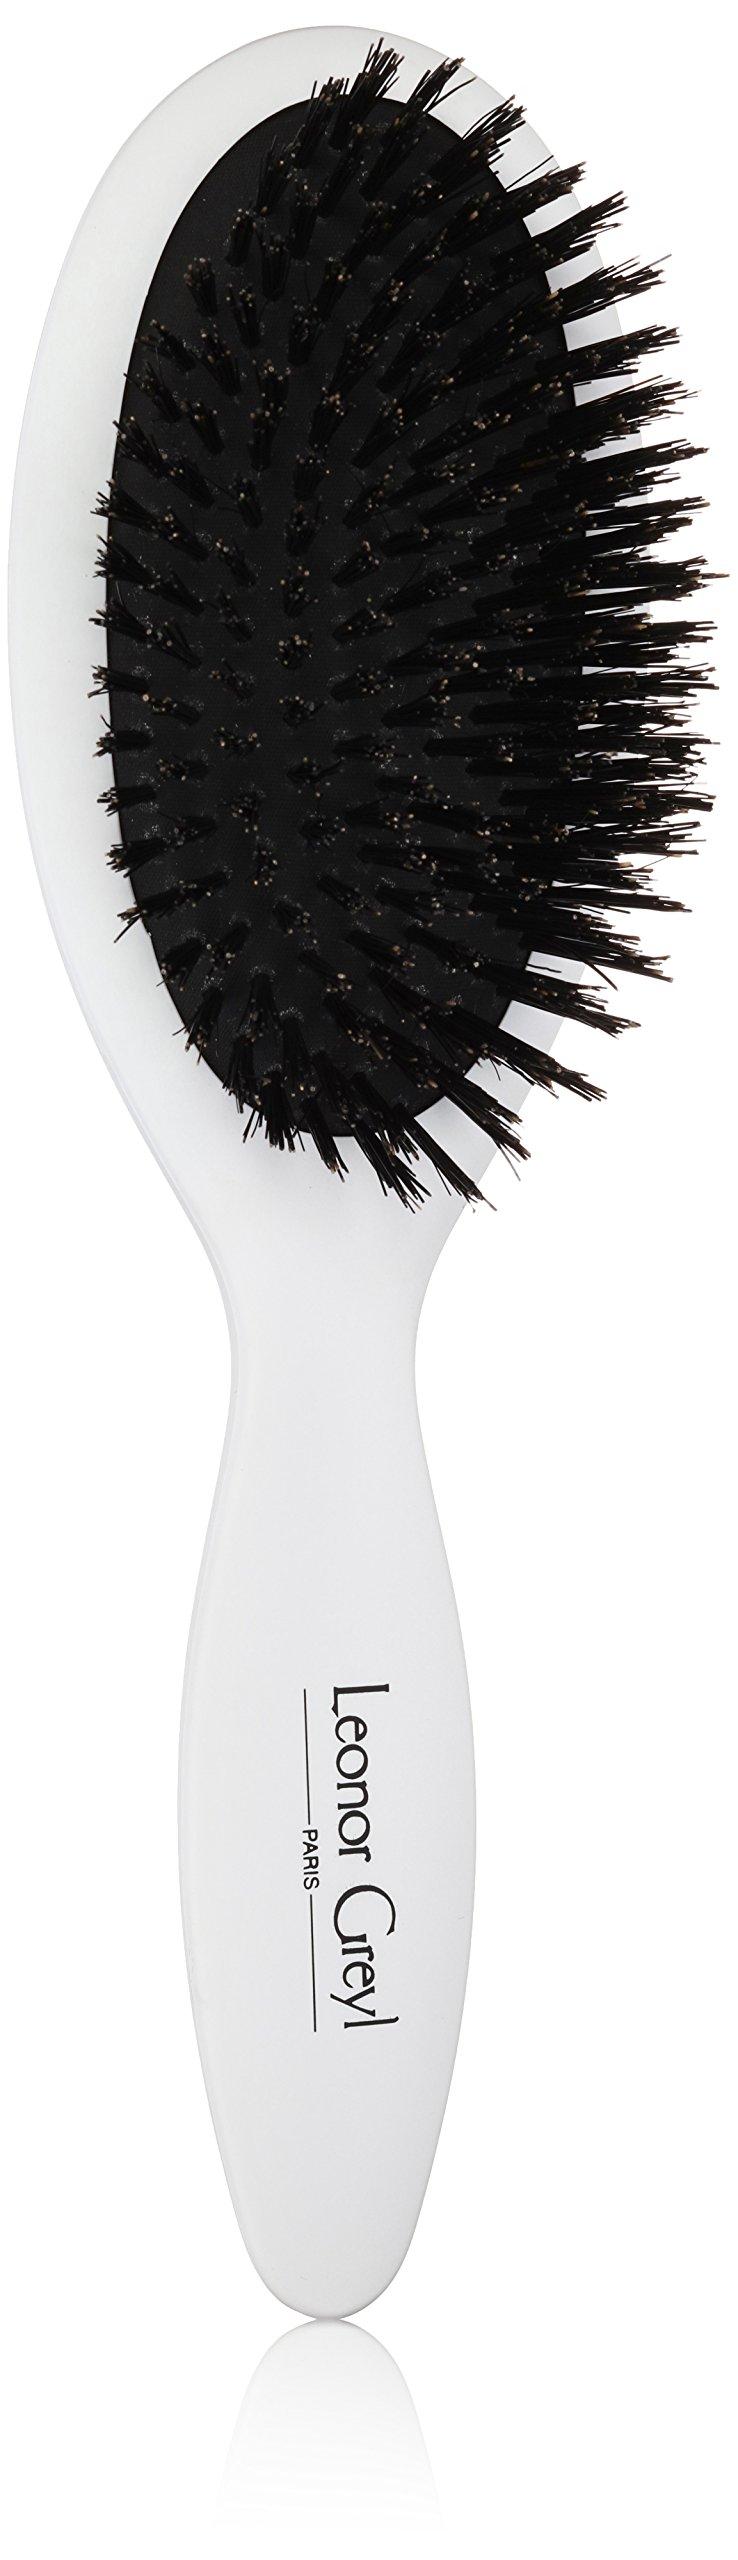 Leonor Greyl Natural Boar Bristle Brush - 71Es 2Bq9JiaL - Leonor Greyl Natural Boar Bristle Brush